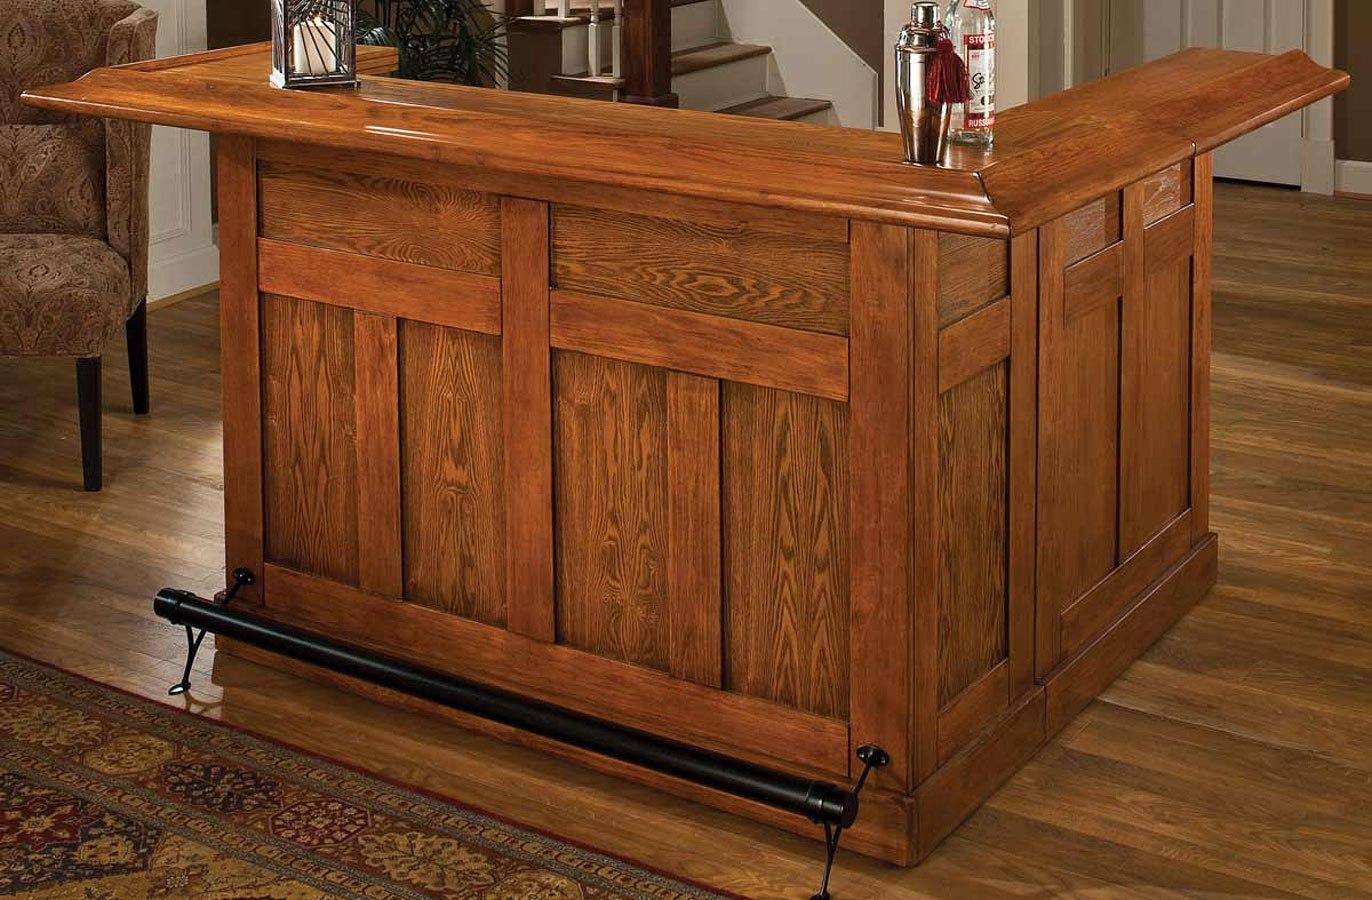 Classic Oak Large Home Bar w/ Side Bar